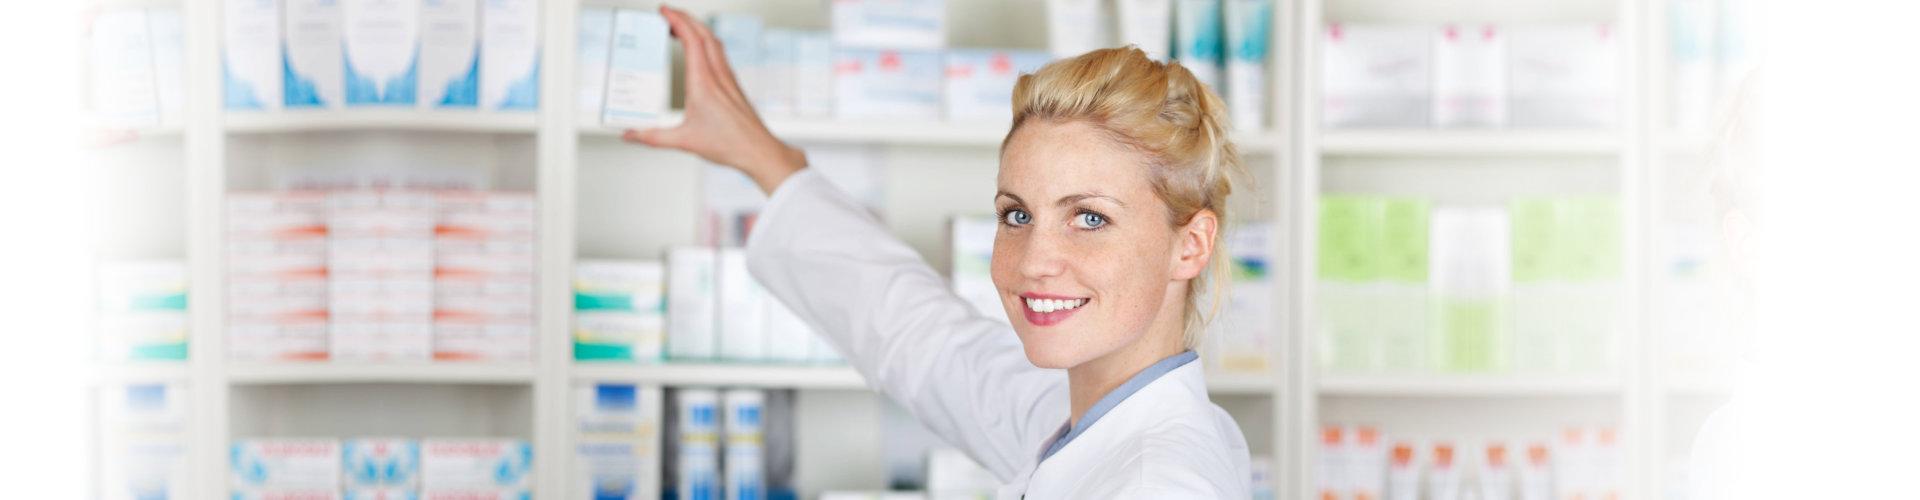 female pharmacist getting medicine from the shelf